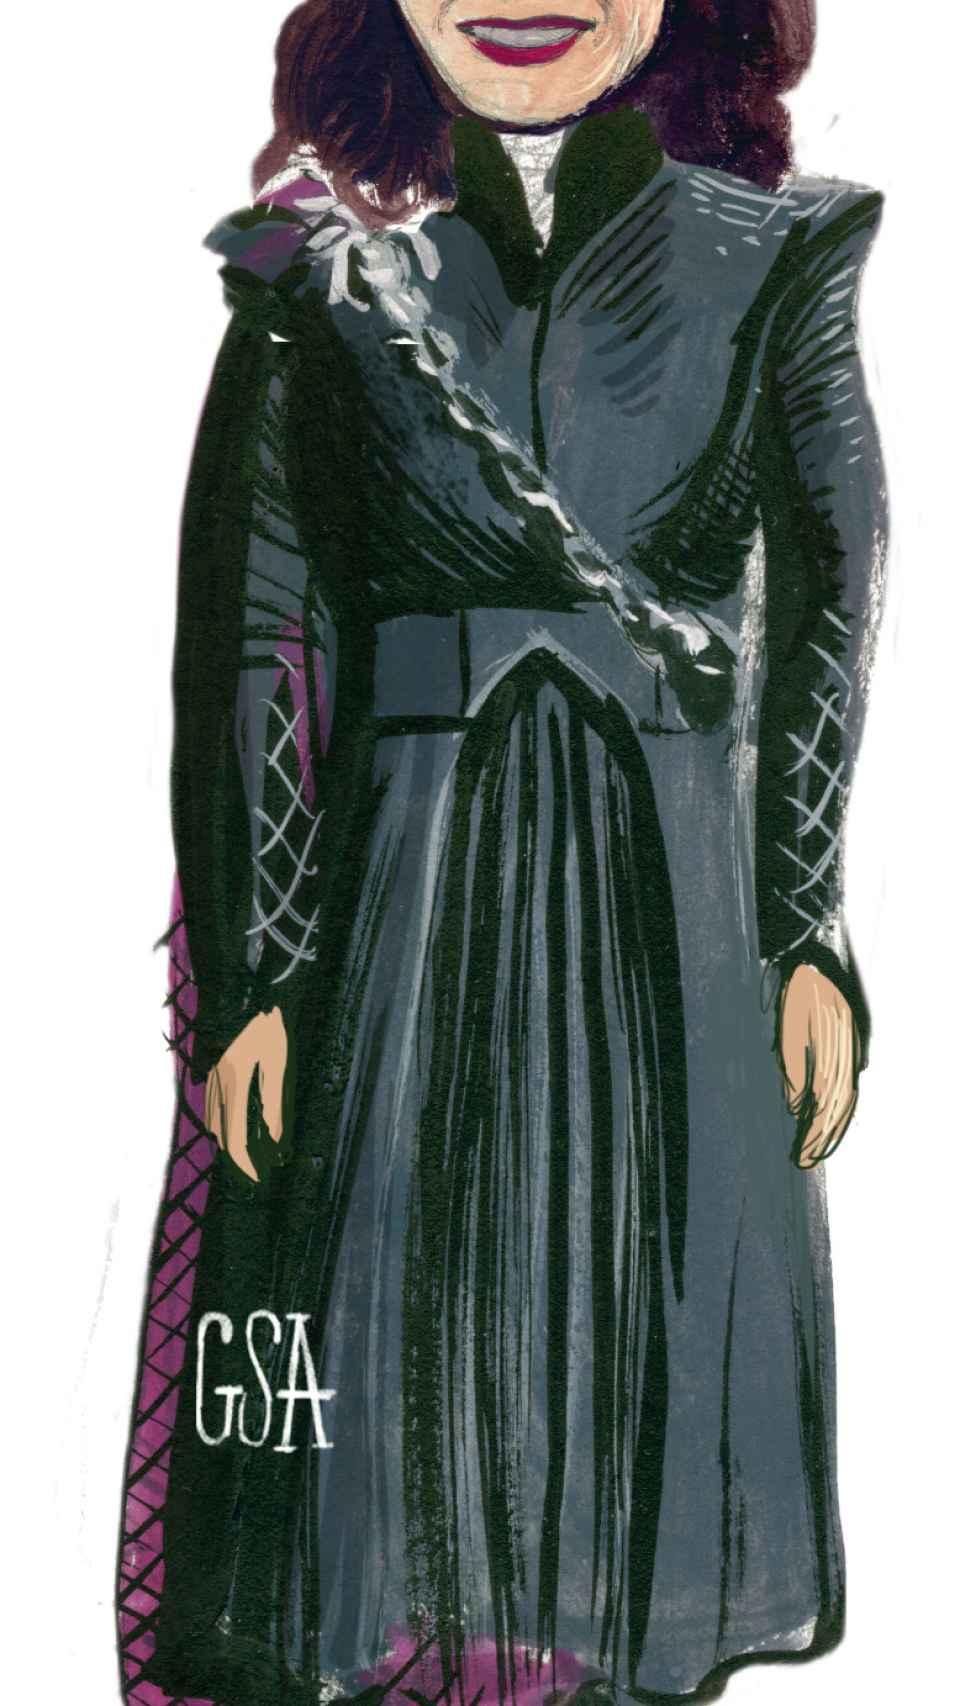 Daenerys Targaryen como Isabel Díaz Ayuso.